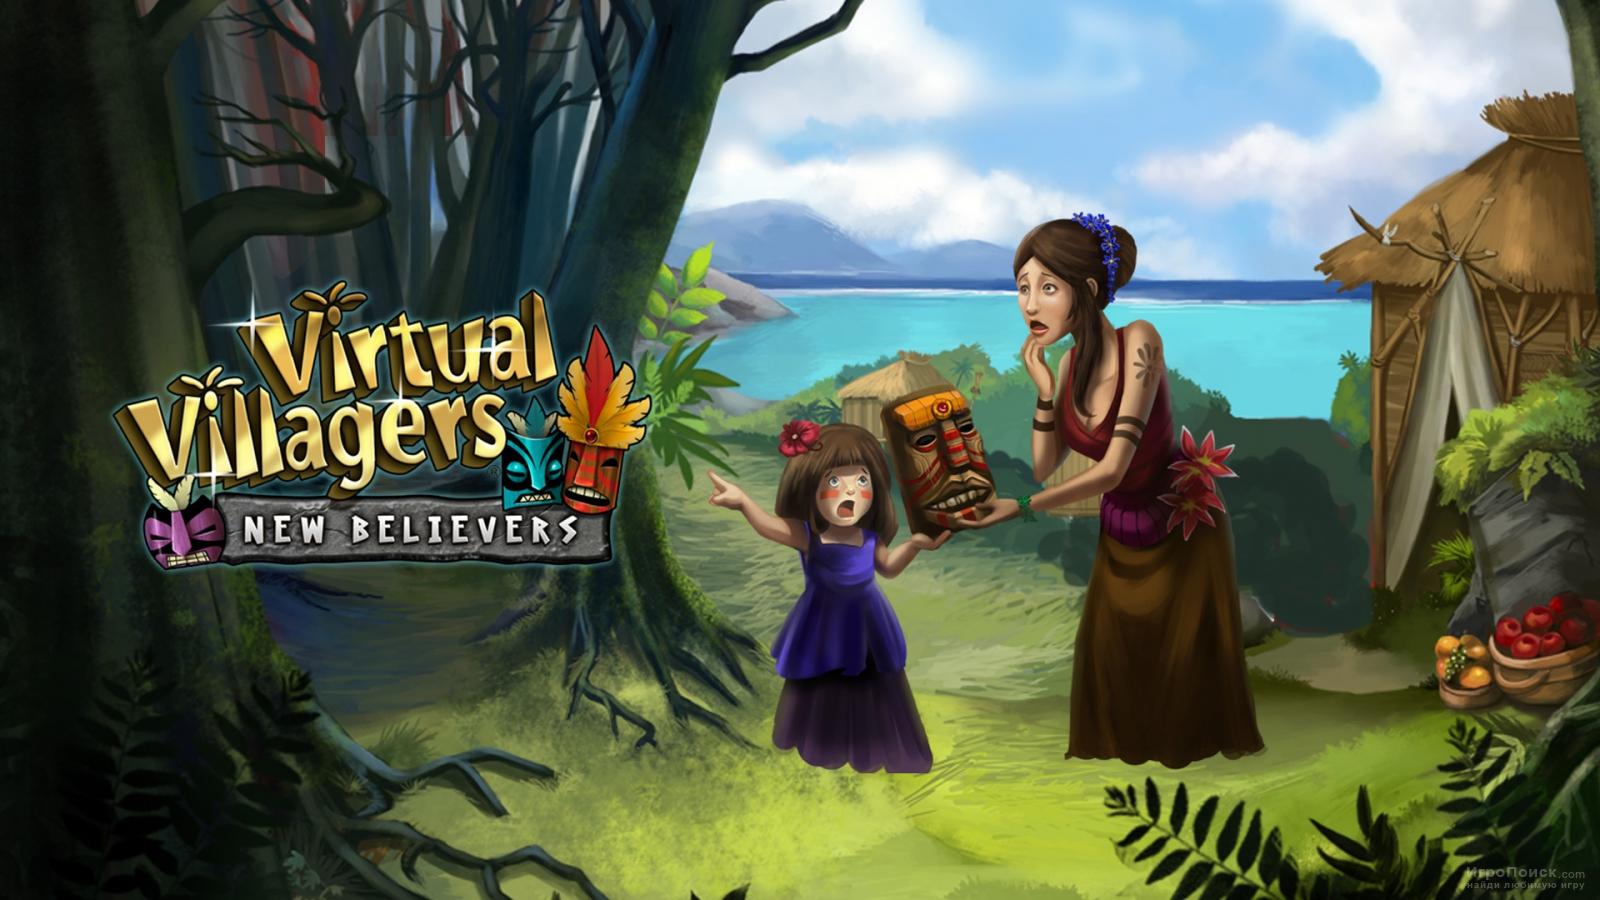 Скриншот к игре Virtual Villagers 5: New Believers